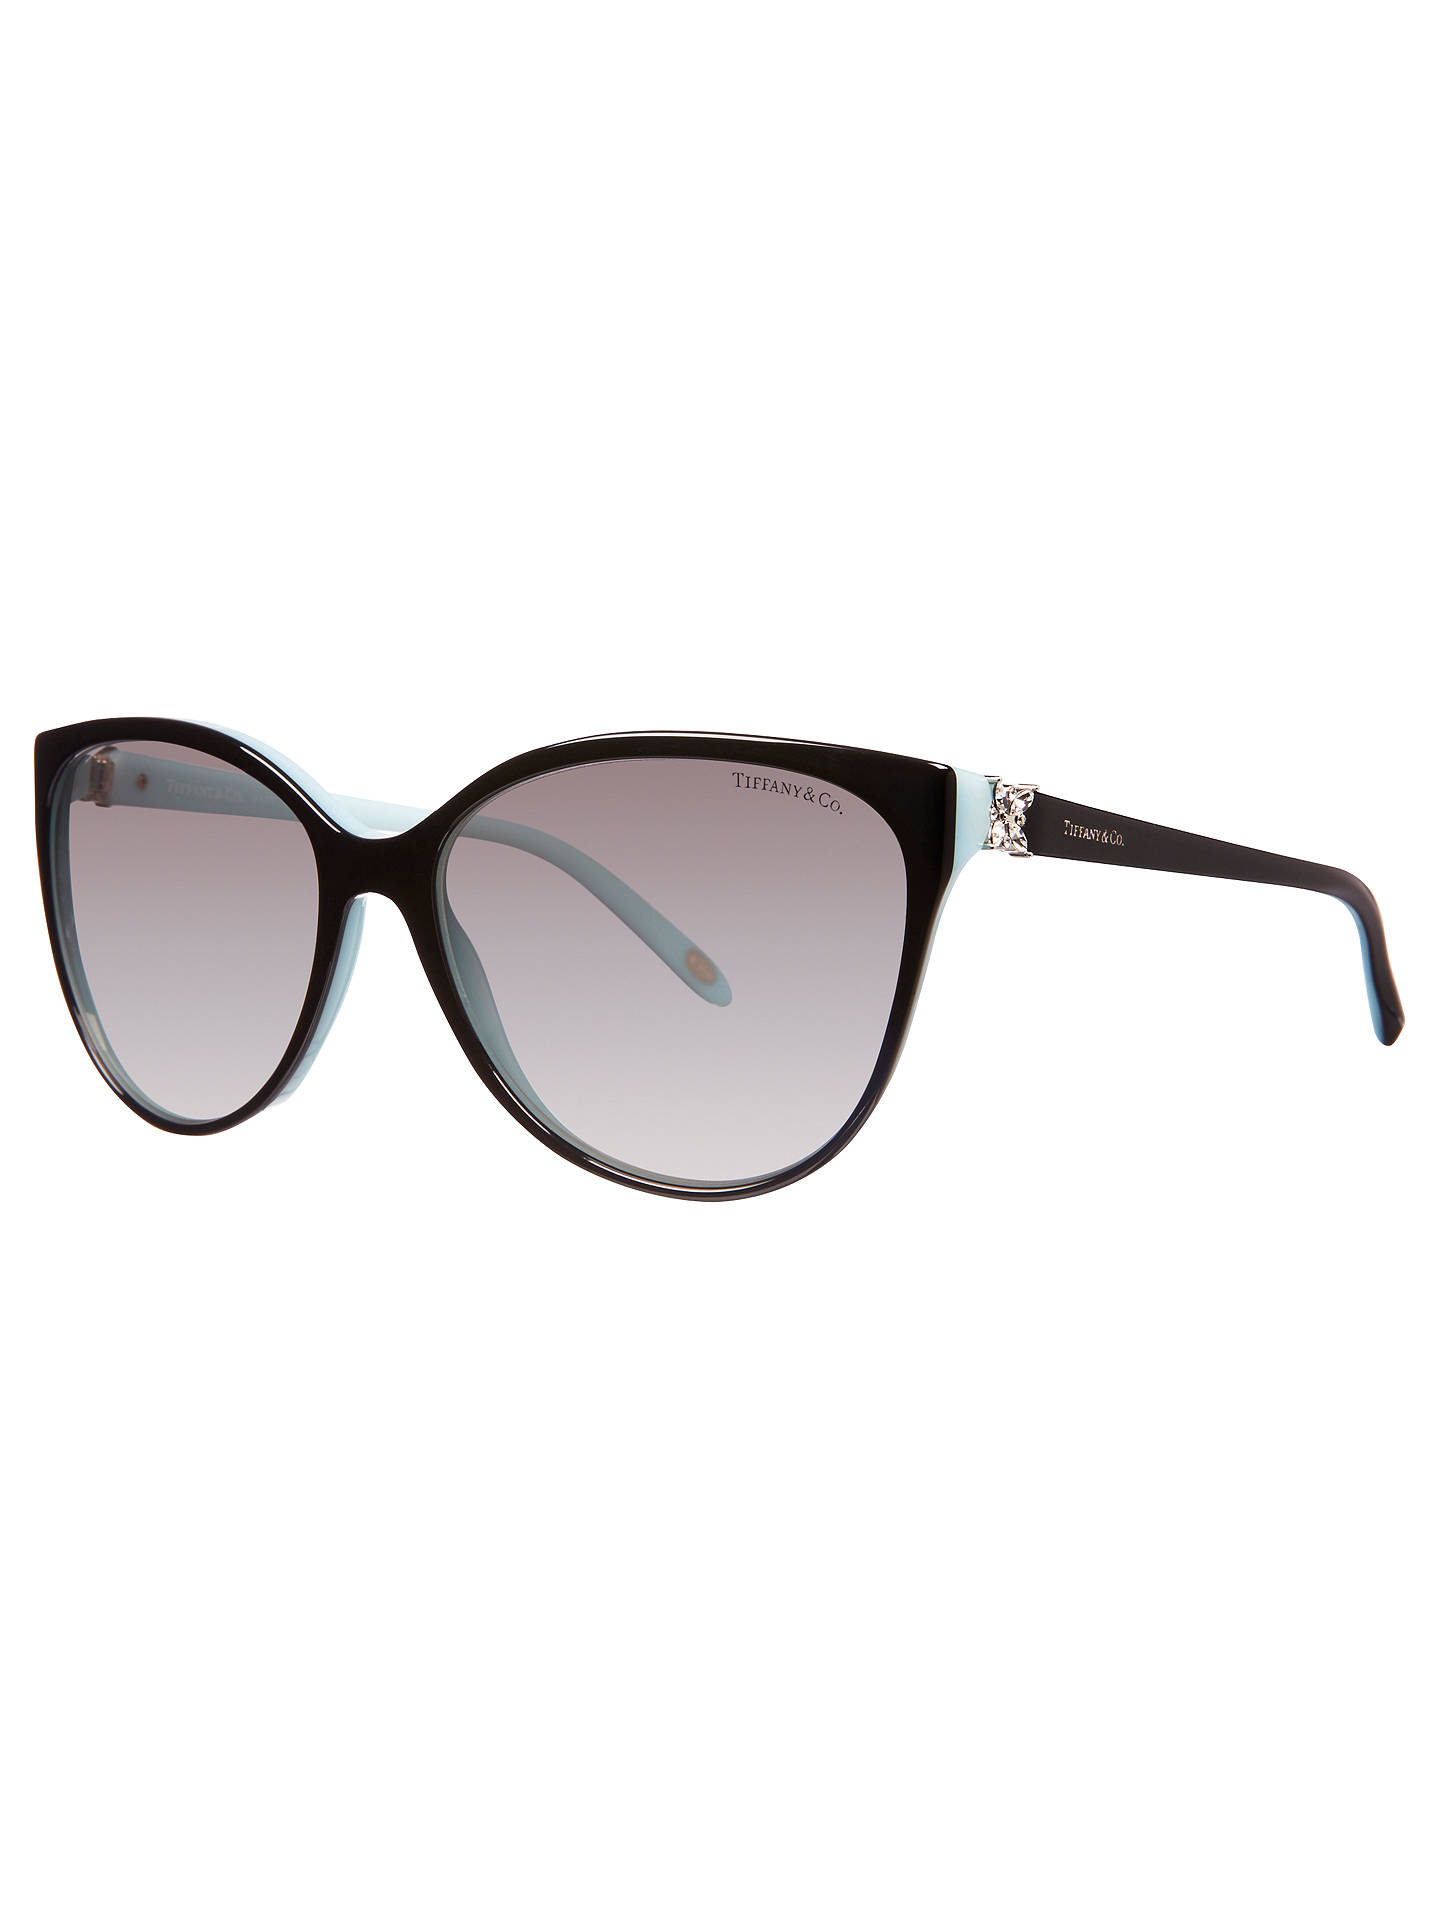 Tiffany & Co TF4089B Cat\'s Eye Frame Sunglasses, Blue/Black at John ...